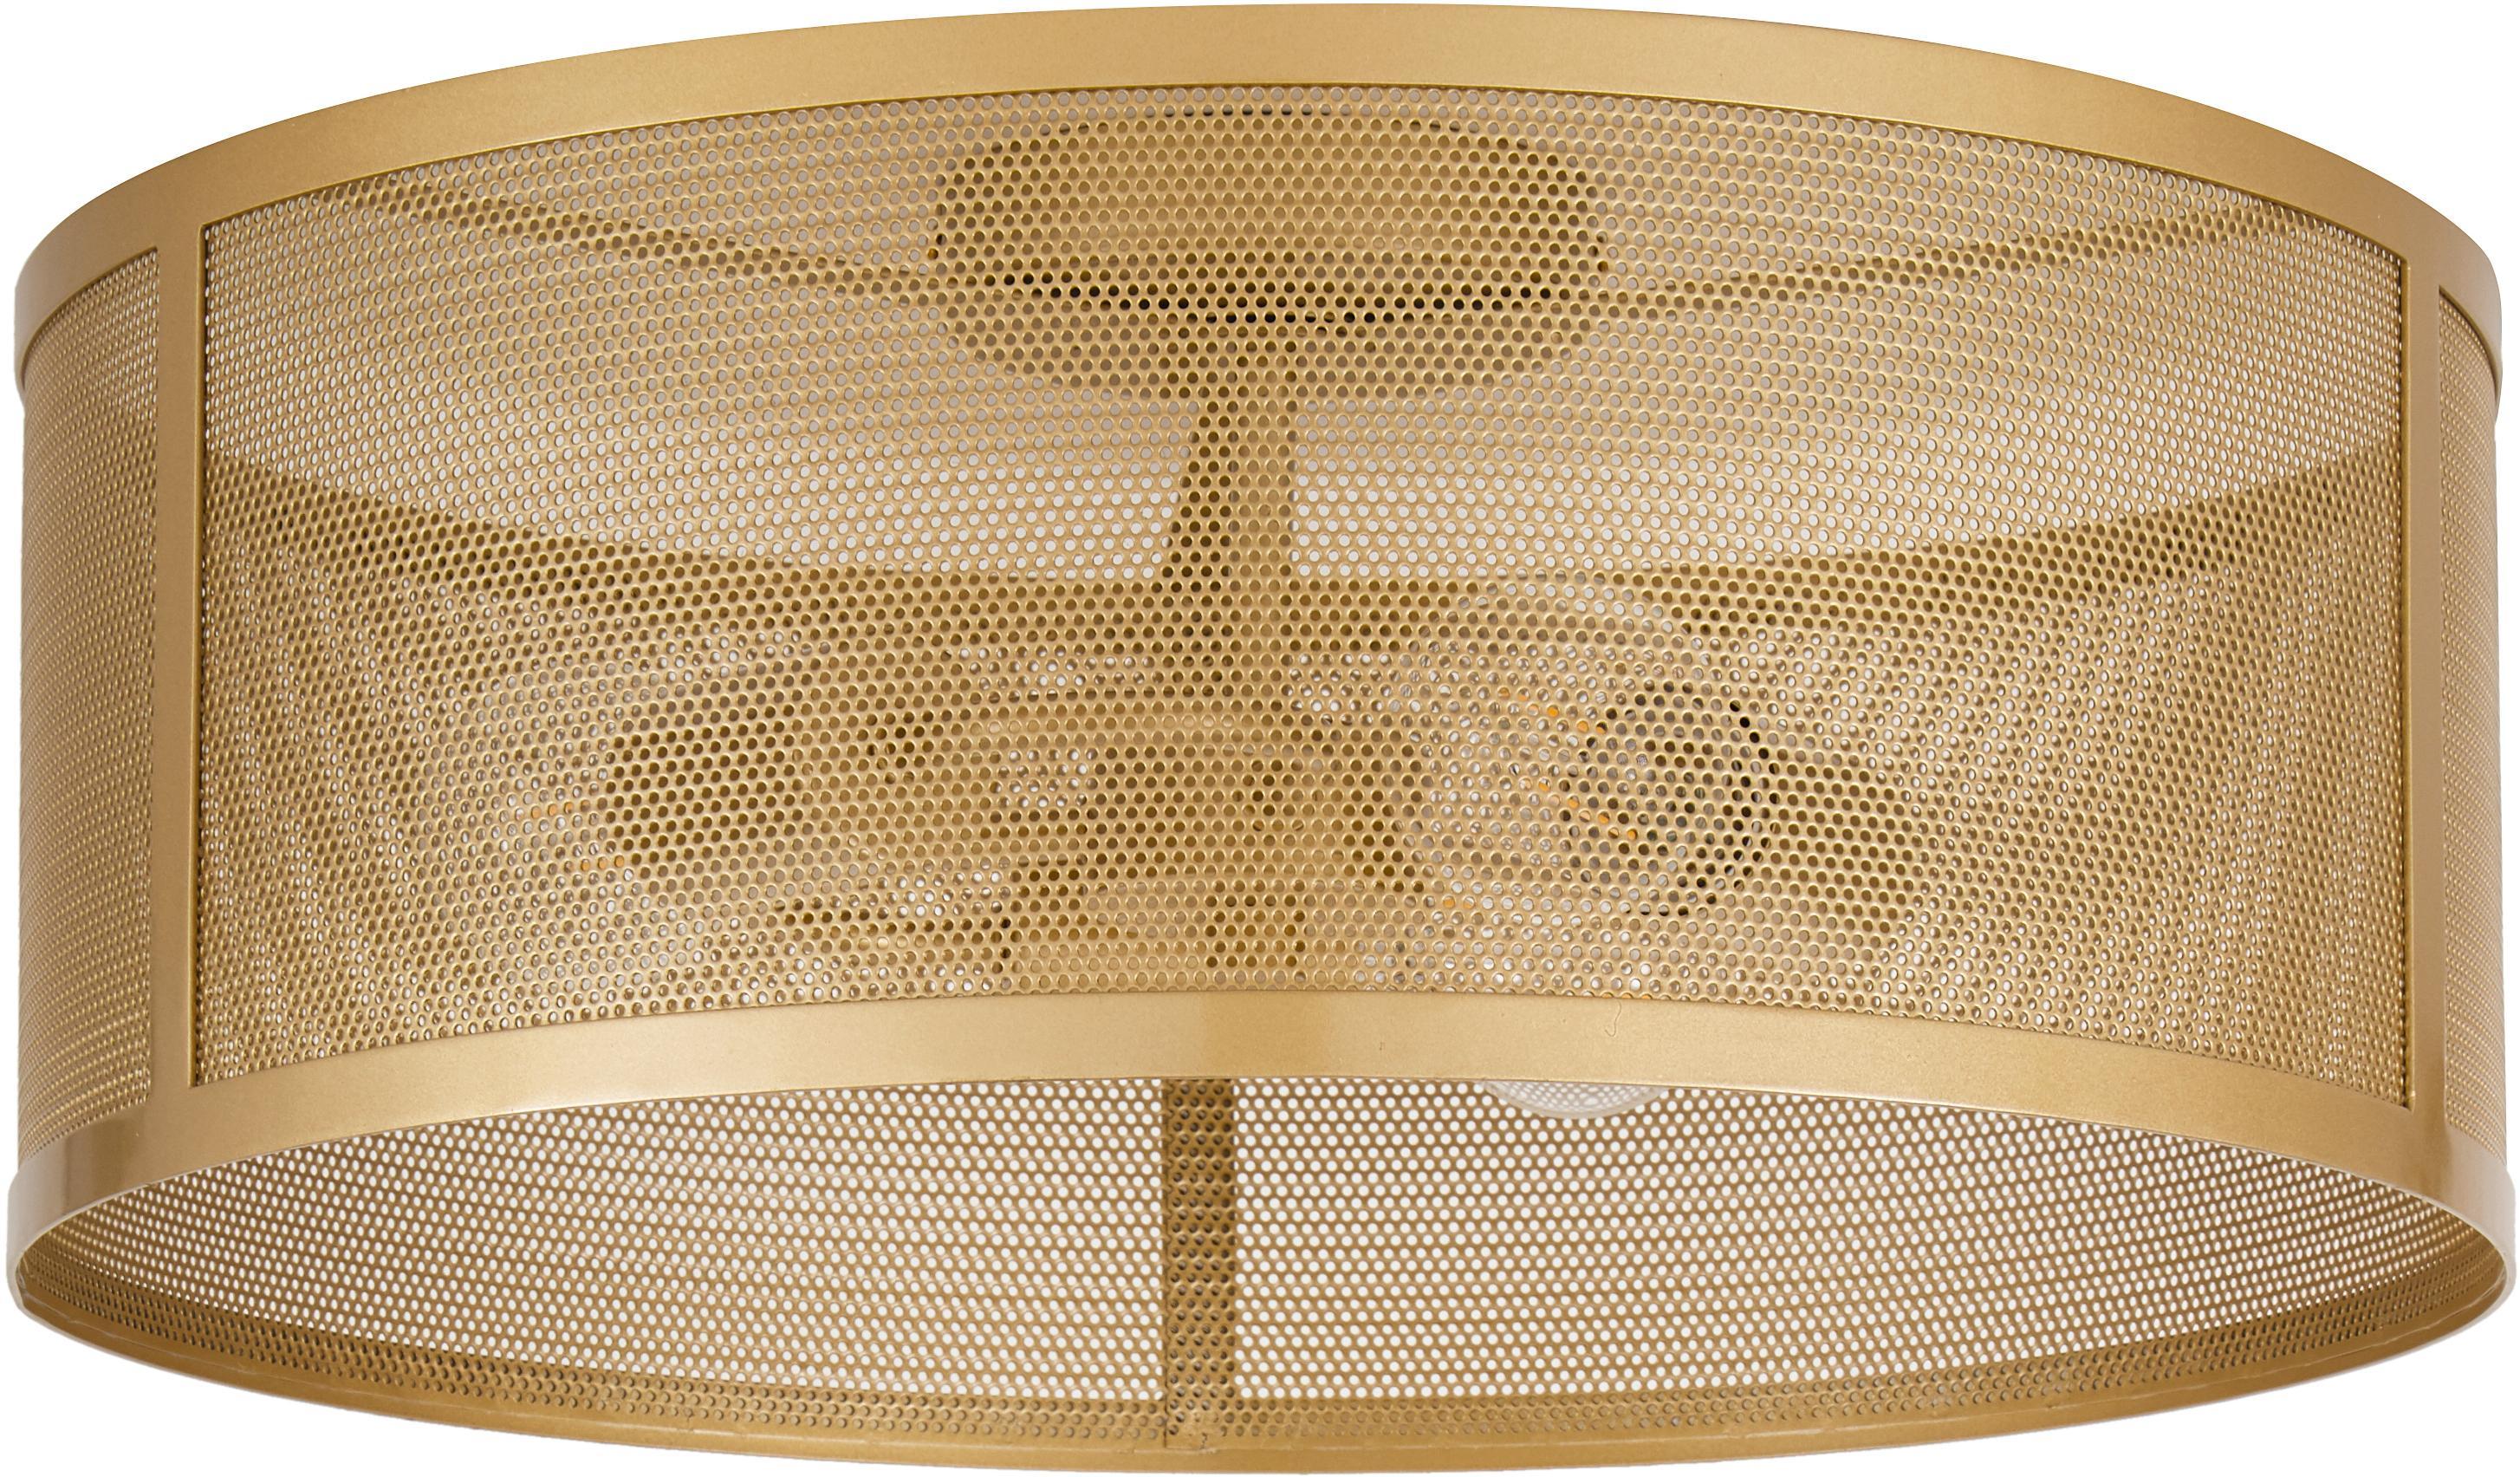 Deckenleuchte Goldy, Metall, beschichtet, Goldfarben, Ø 45 x H 21 cm